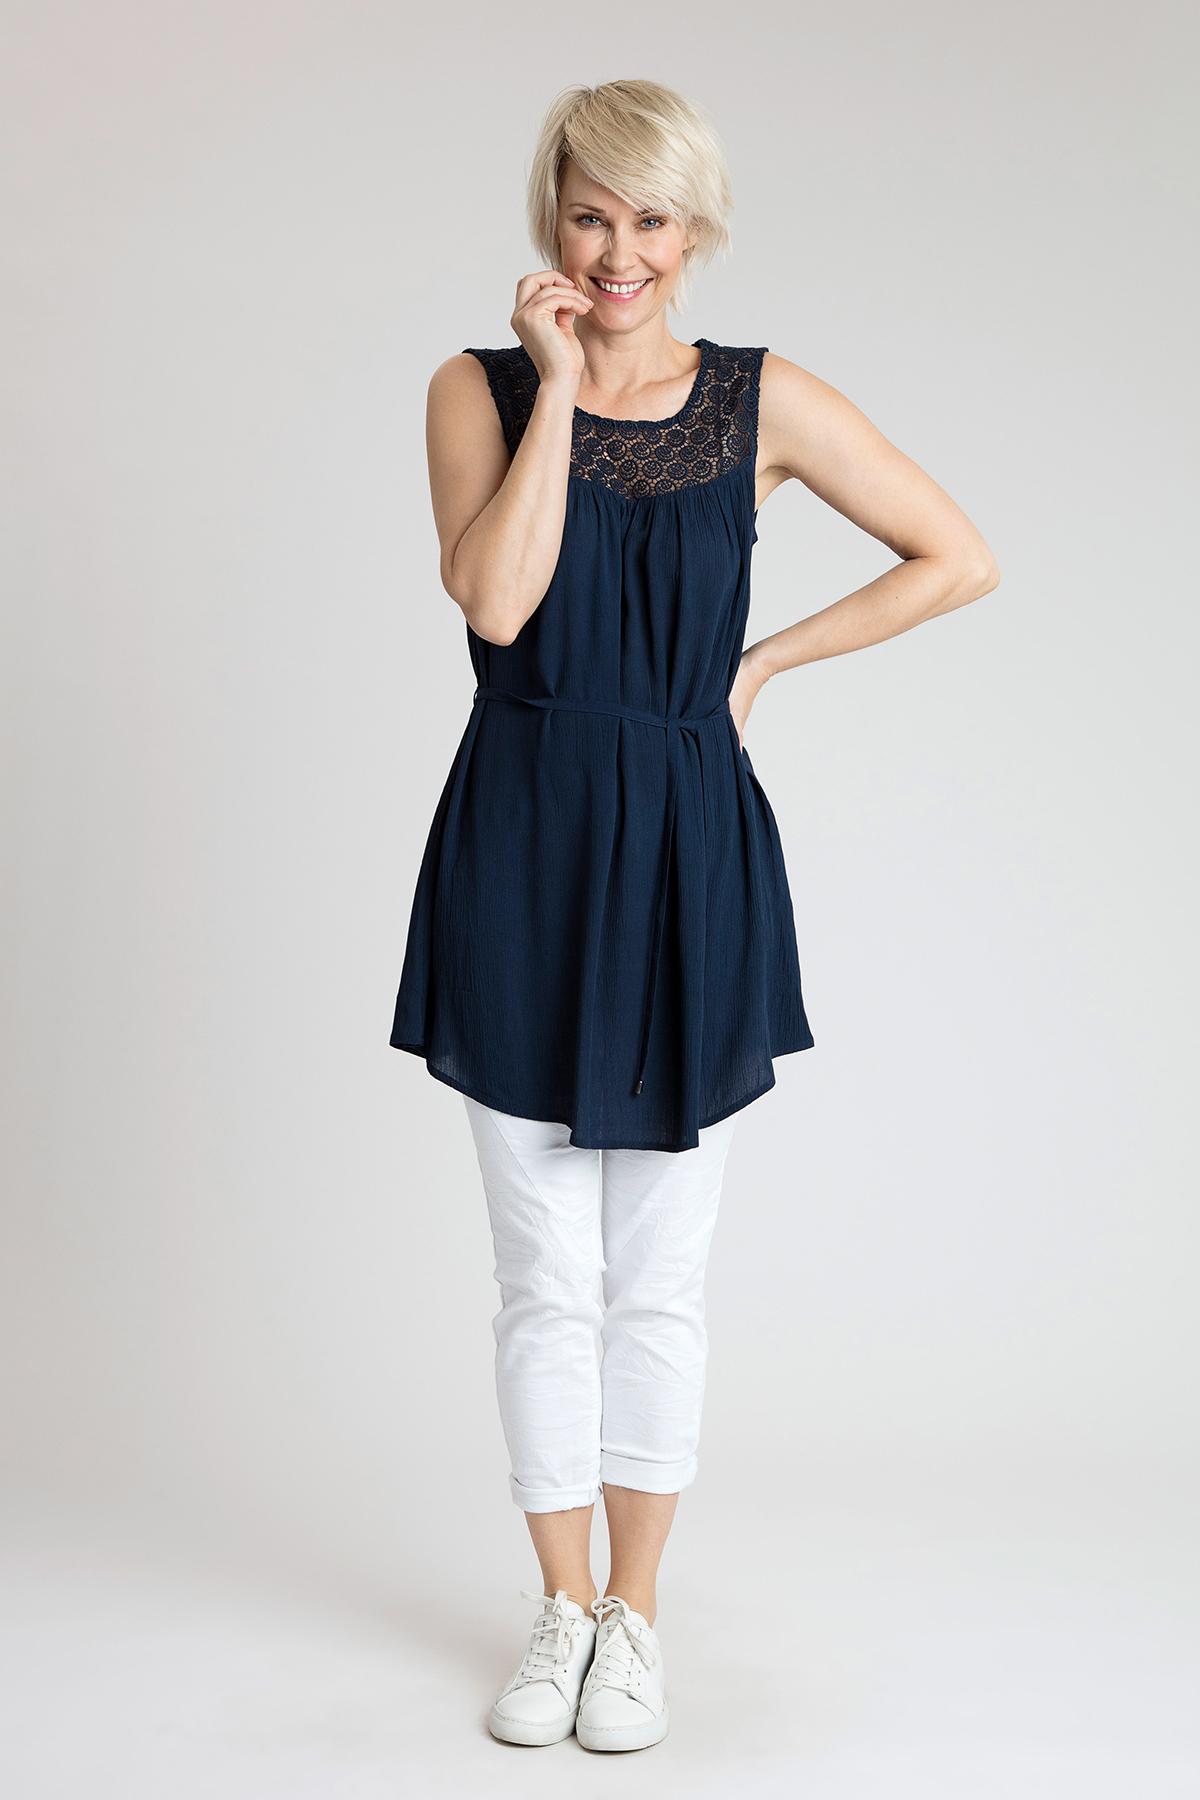 Blå Tunika fra Bon'A Parte – Køb Blå Tunika fra str. S-2XL her